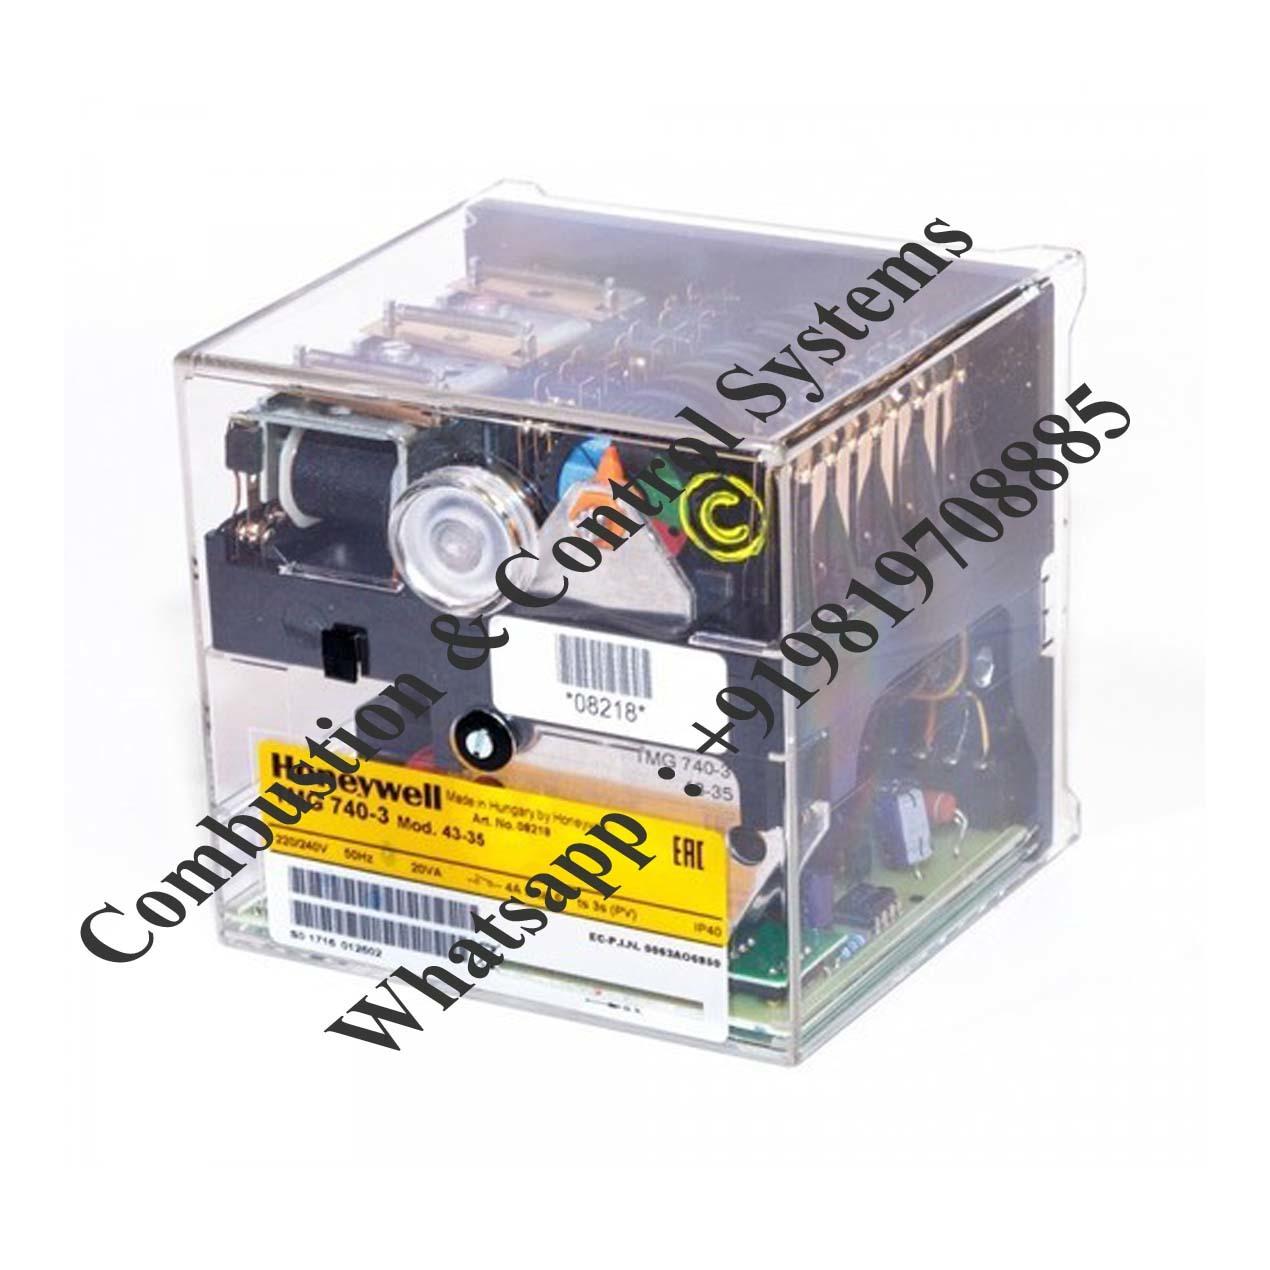 Honeywell Burner Controller 740 - 3